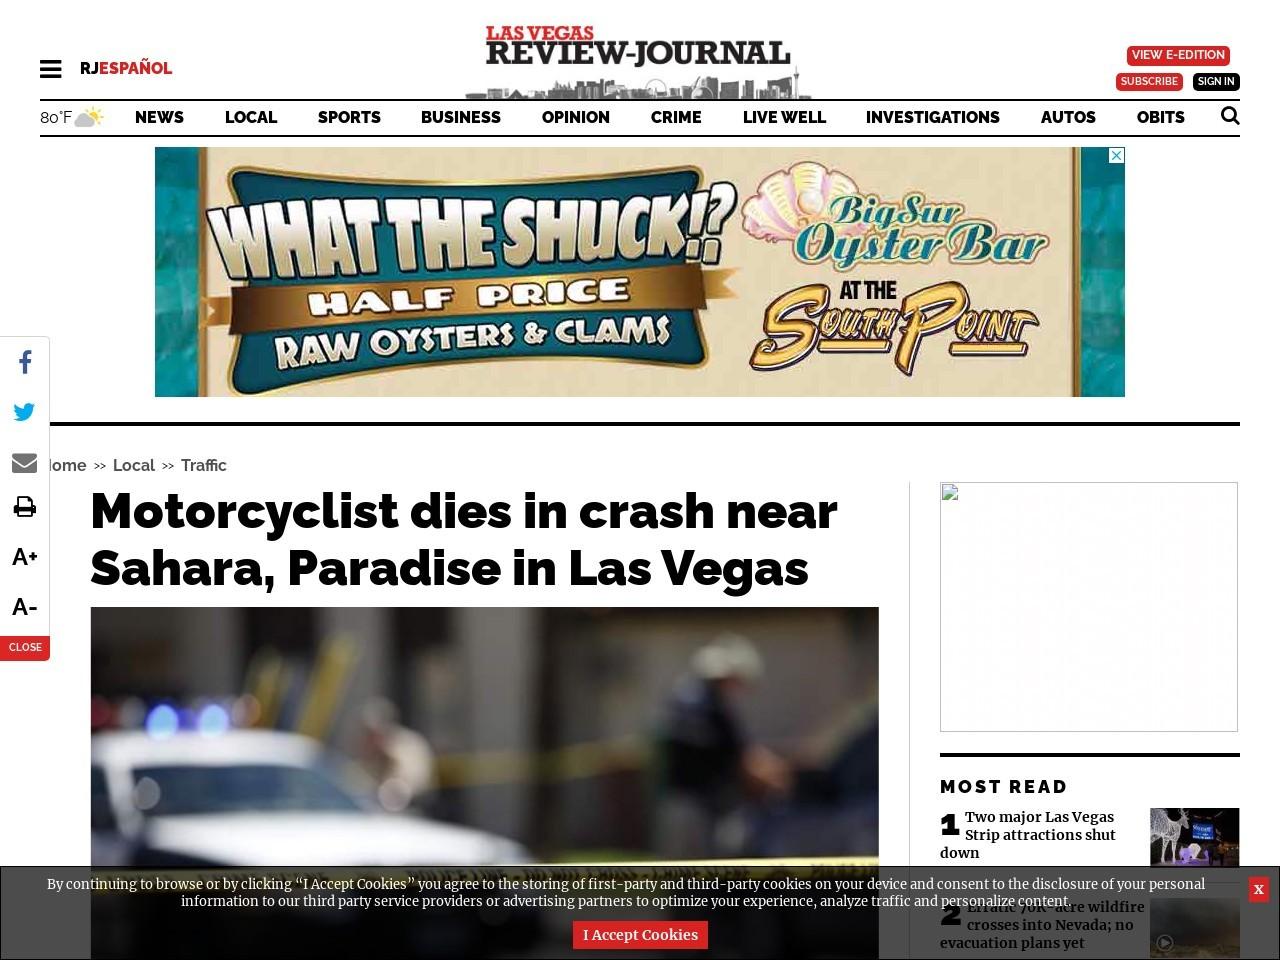 Motorcyclist dies in crash near Sahara, Paradise in Las Vegas